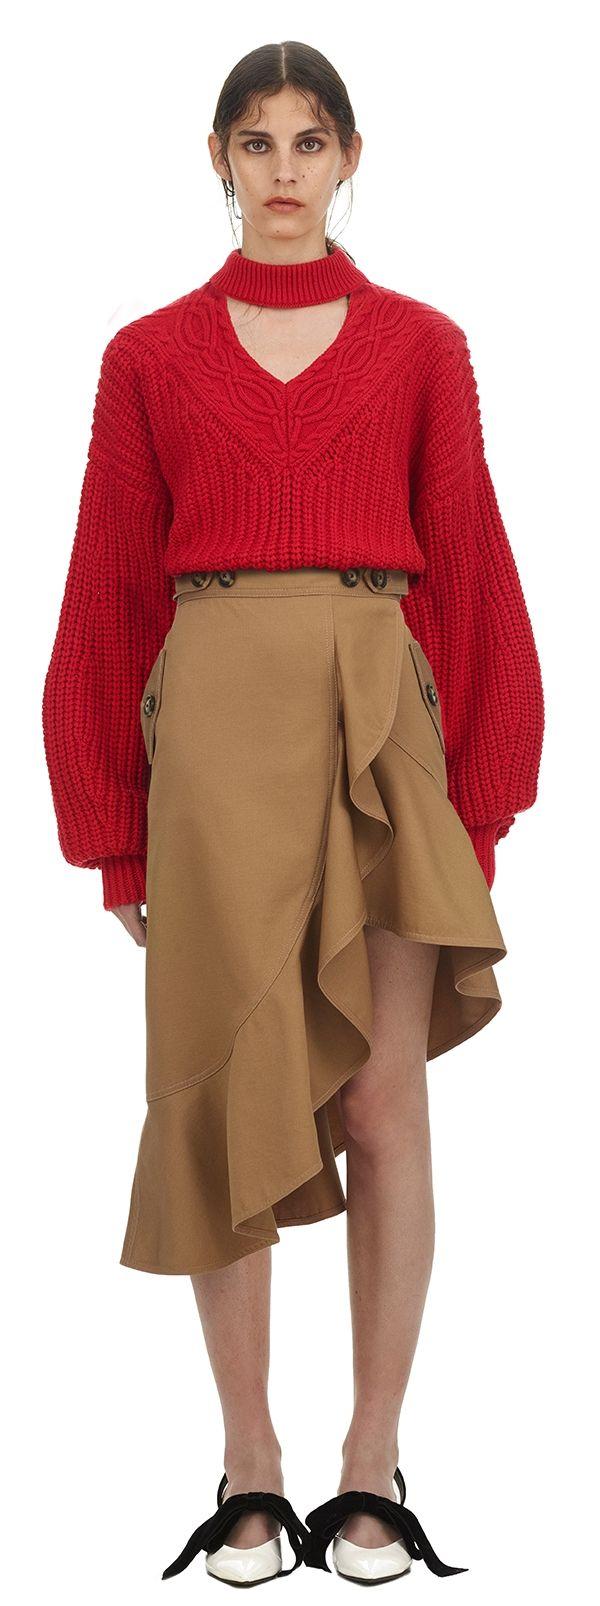 skirt, tan, khaki, long skirt, maxi skirt, maxi dress